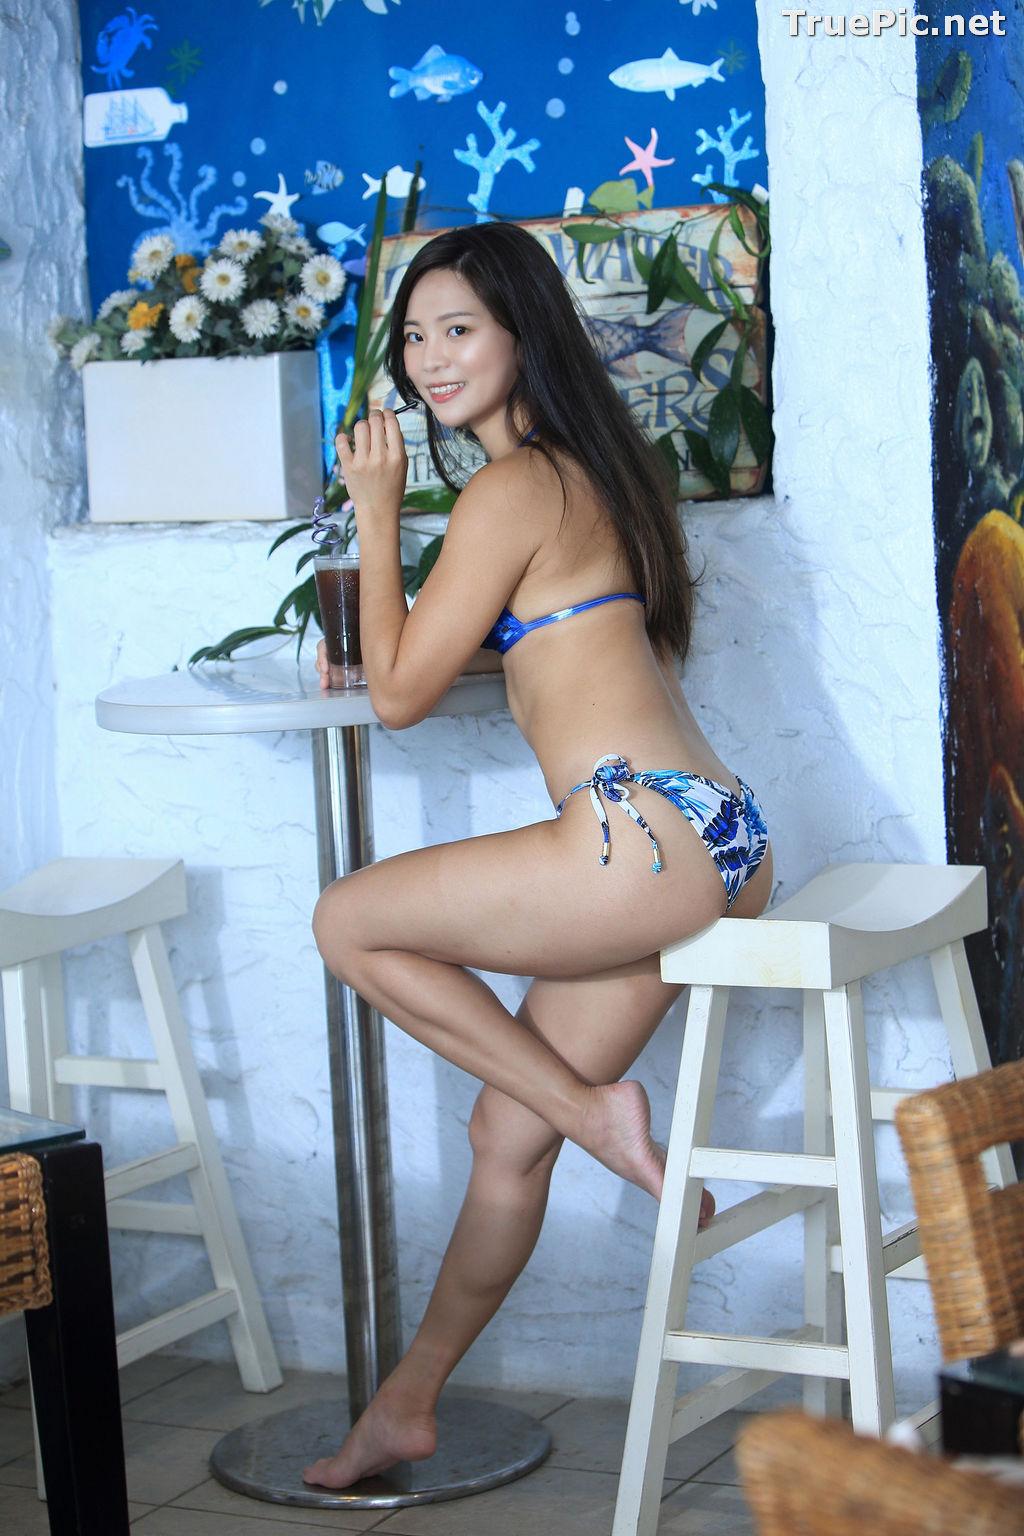 Image Taiwanese Model - Shelly - Beautiful Bodybuilding Bikini Girl - TruePic.net - Picture-42